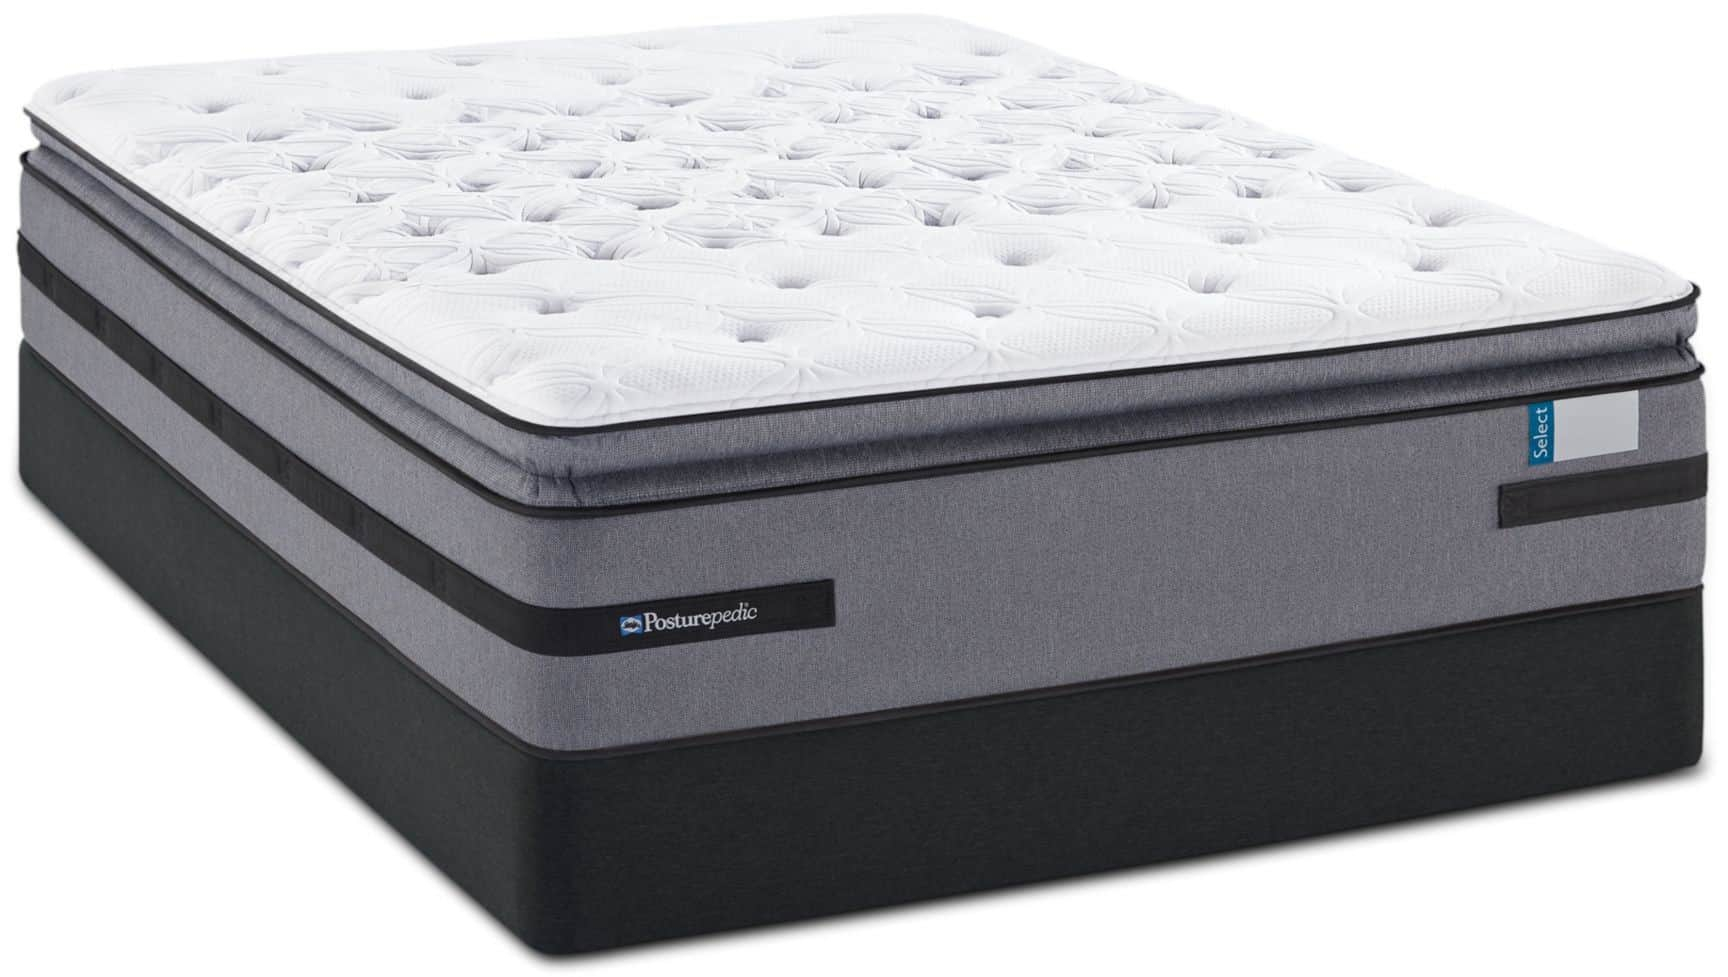 Sealy Posturepedic Select Yonge Street Firm Euro Pillow Top Mattress